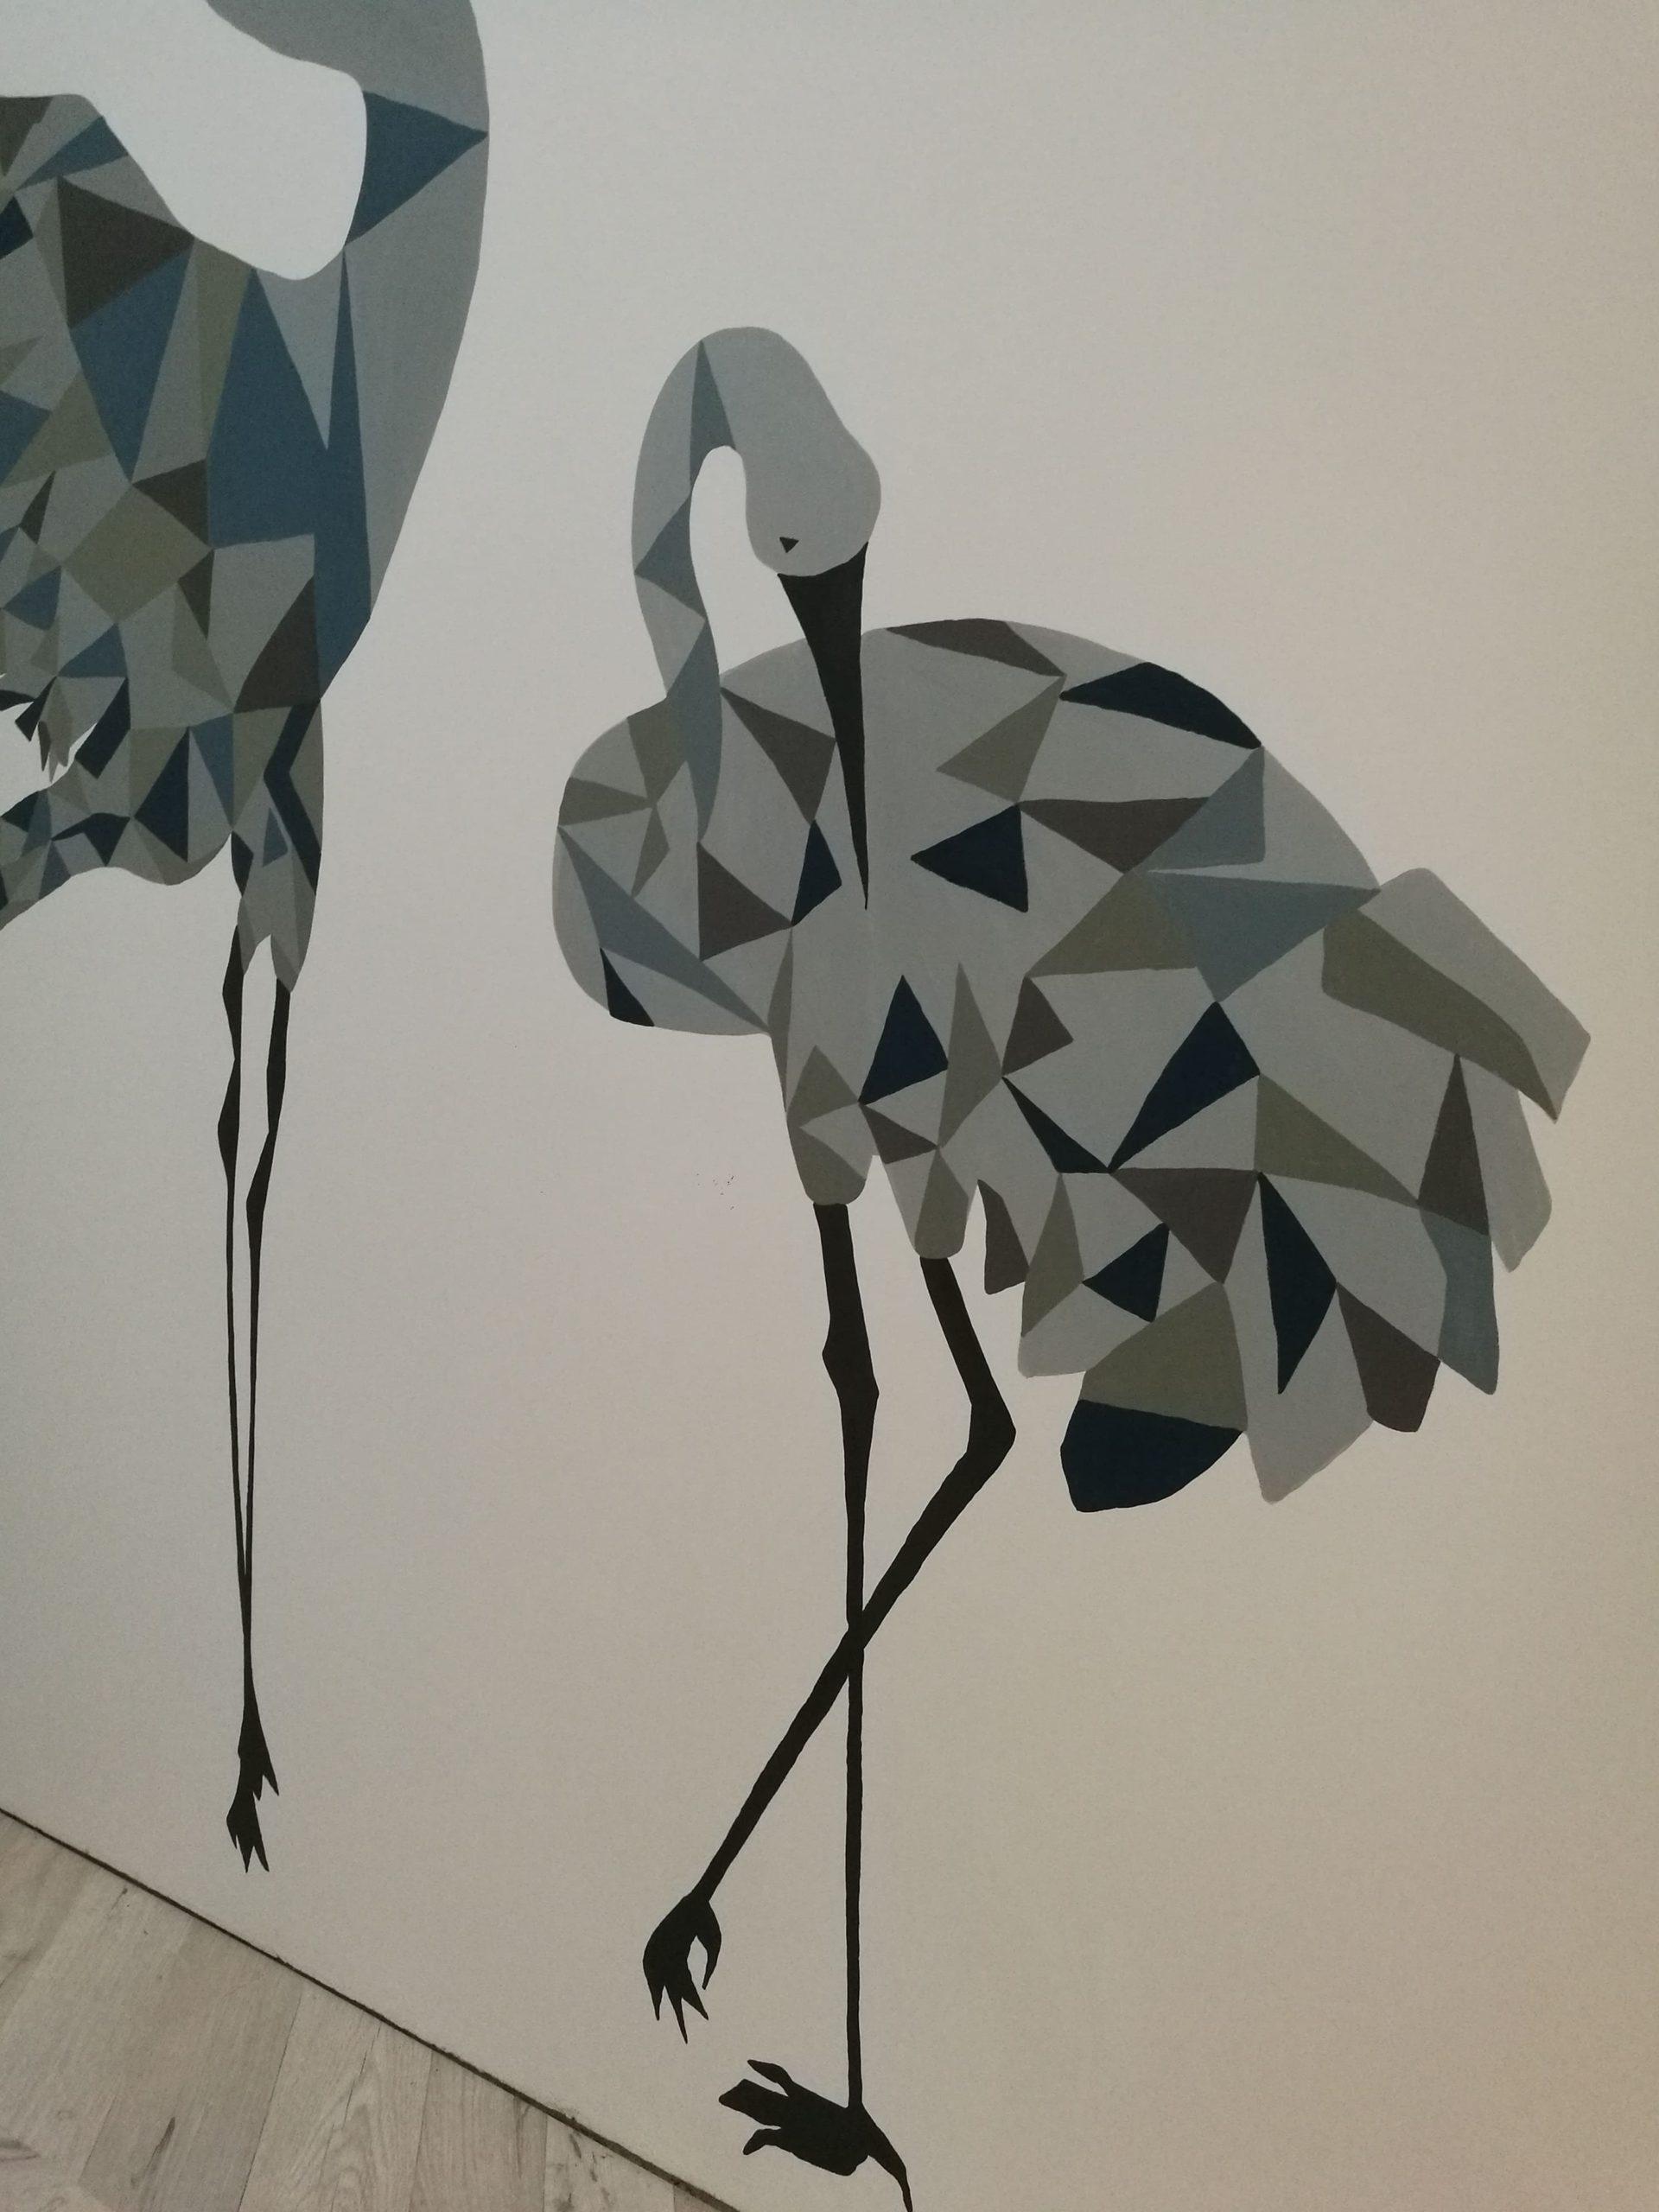 menine-kuryba-sienu-dekoravimas-ivairus-interjerai (8)